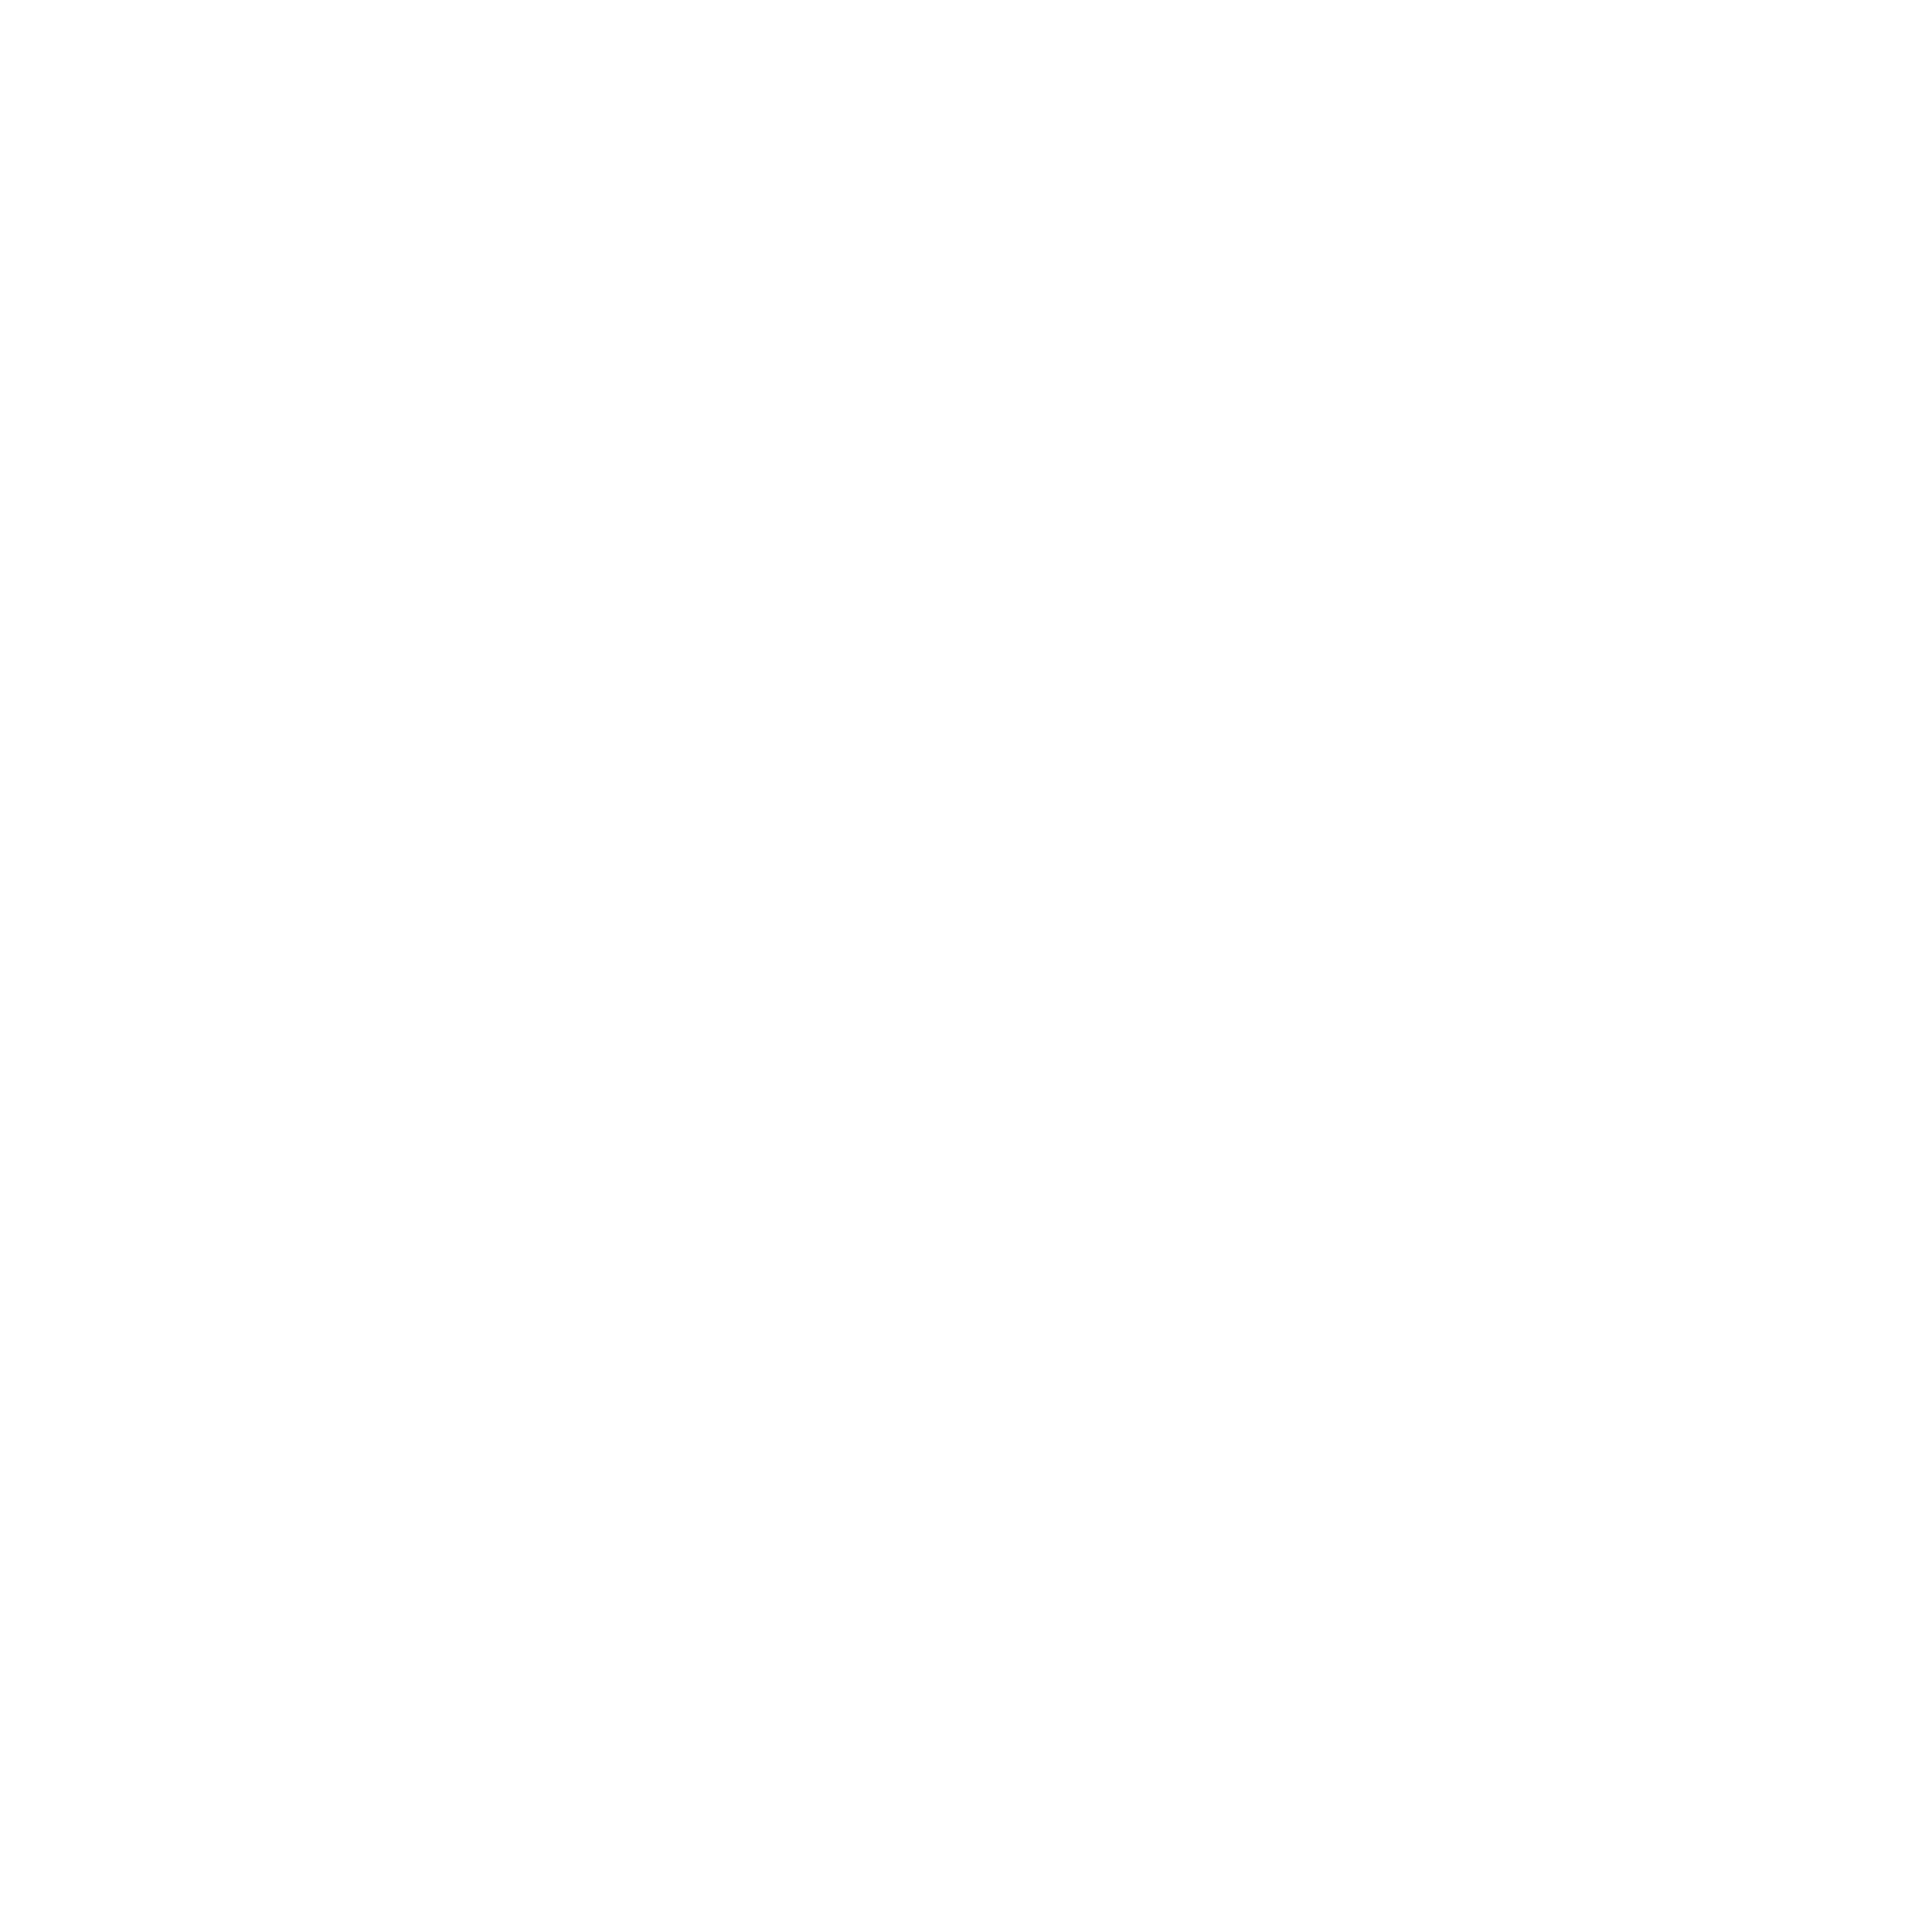 img_0190-001